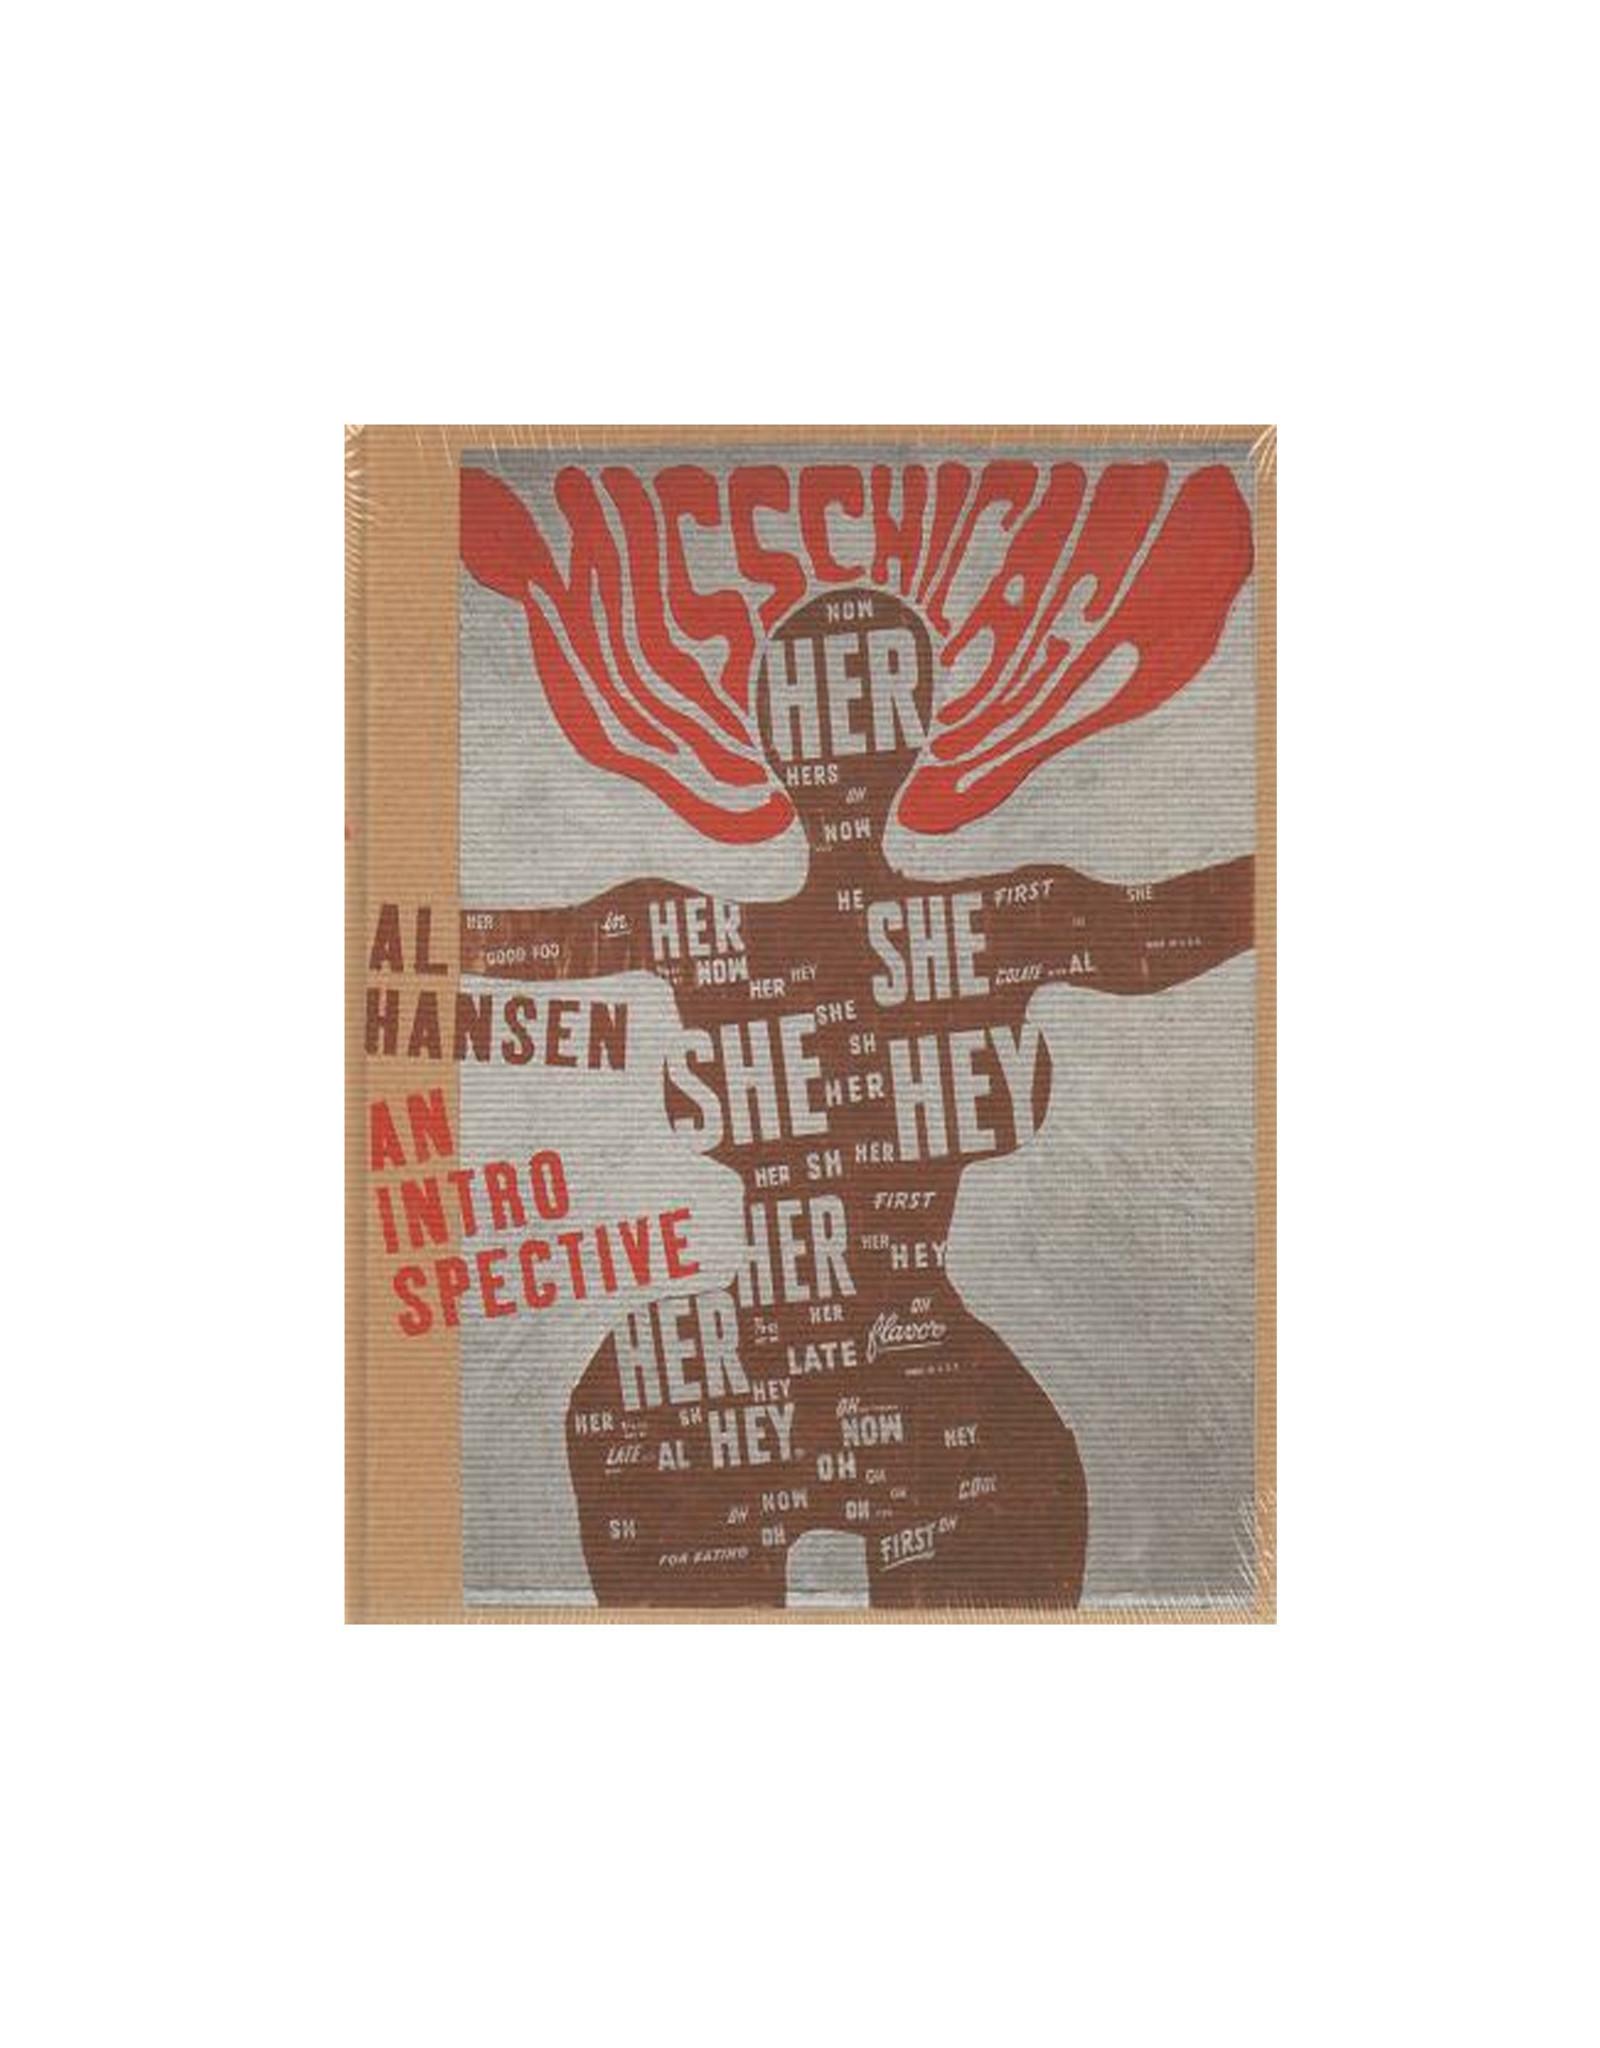 Al Hansen: An Introspection